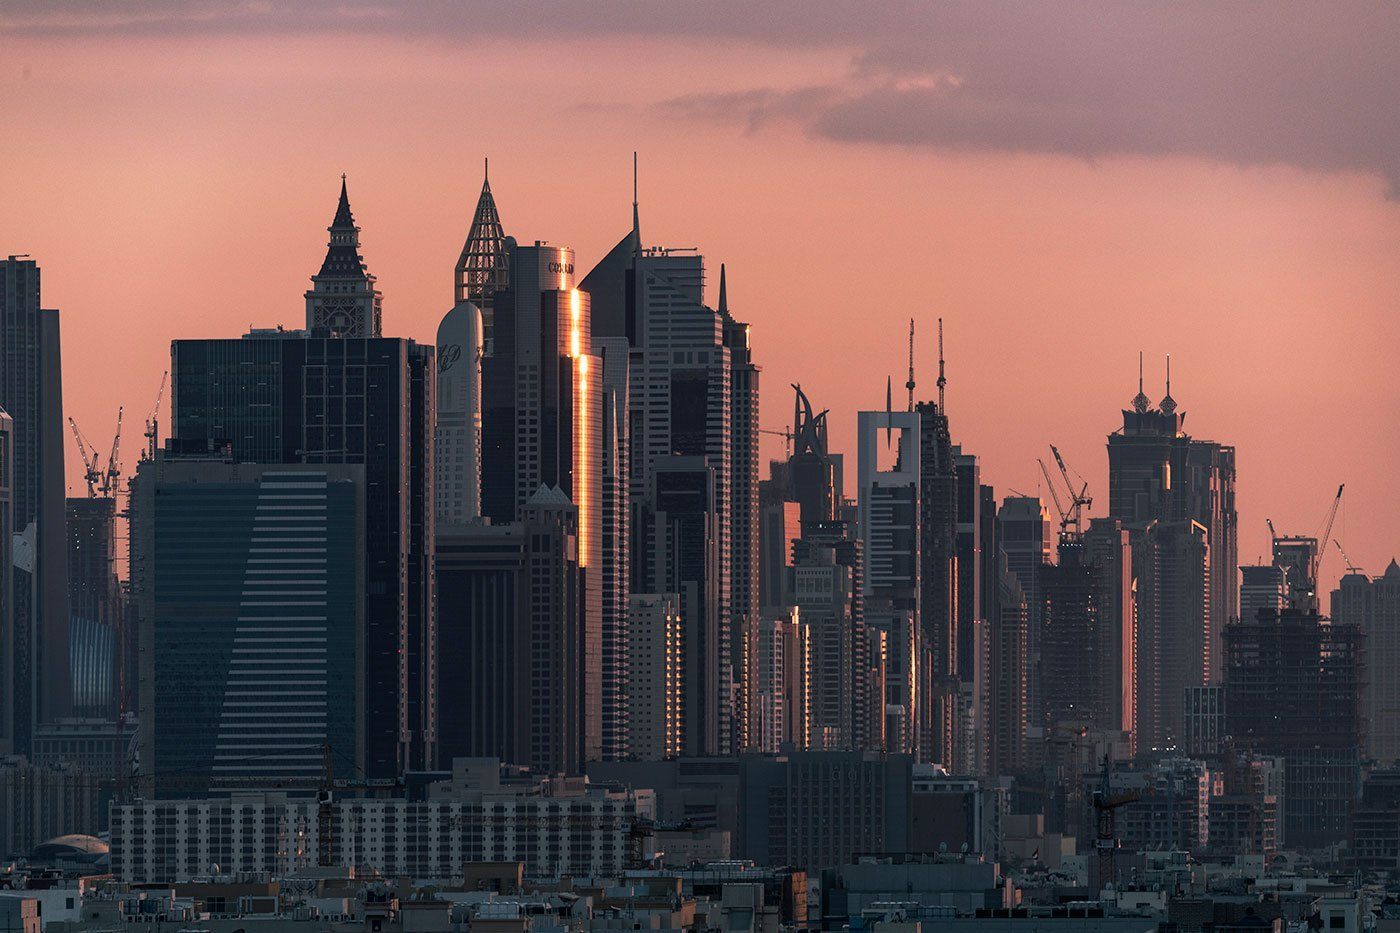 sunset glows reflecting on the glass facades of the Dubai skyline